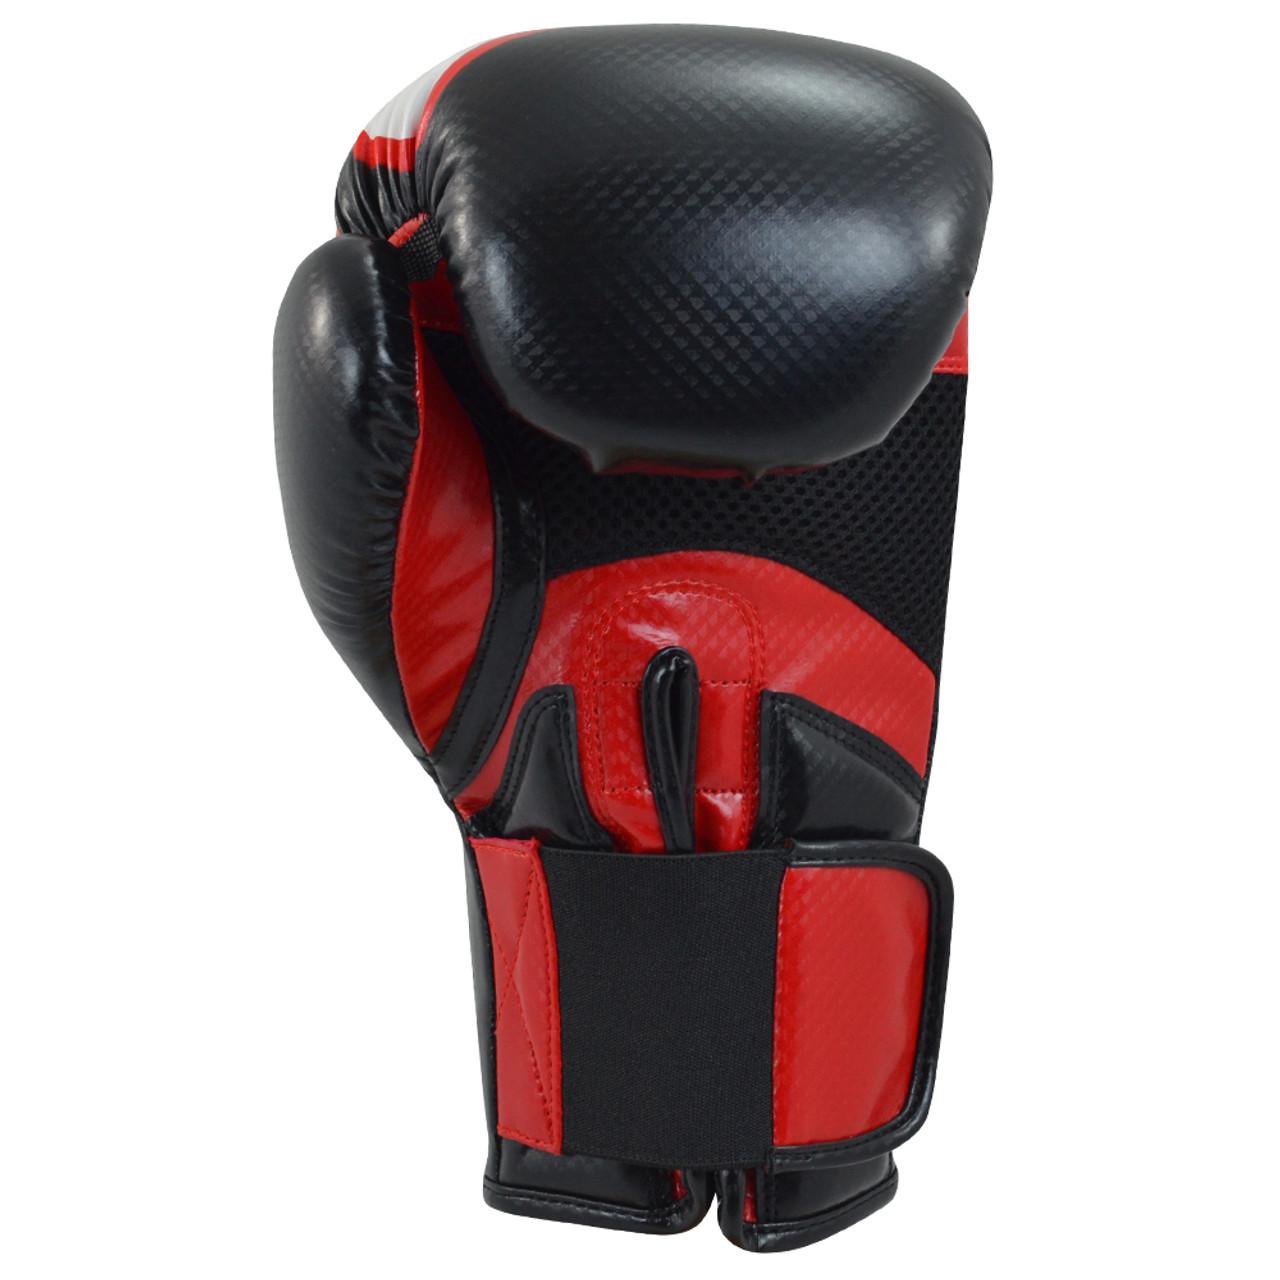 CR Turbo Black & Red Boxing Gloves - Combat Corner